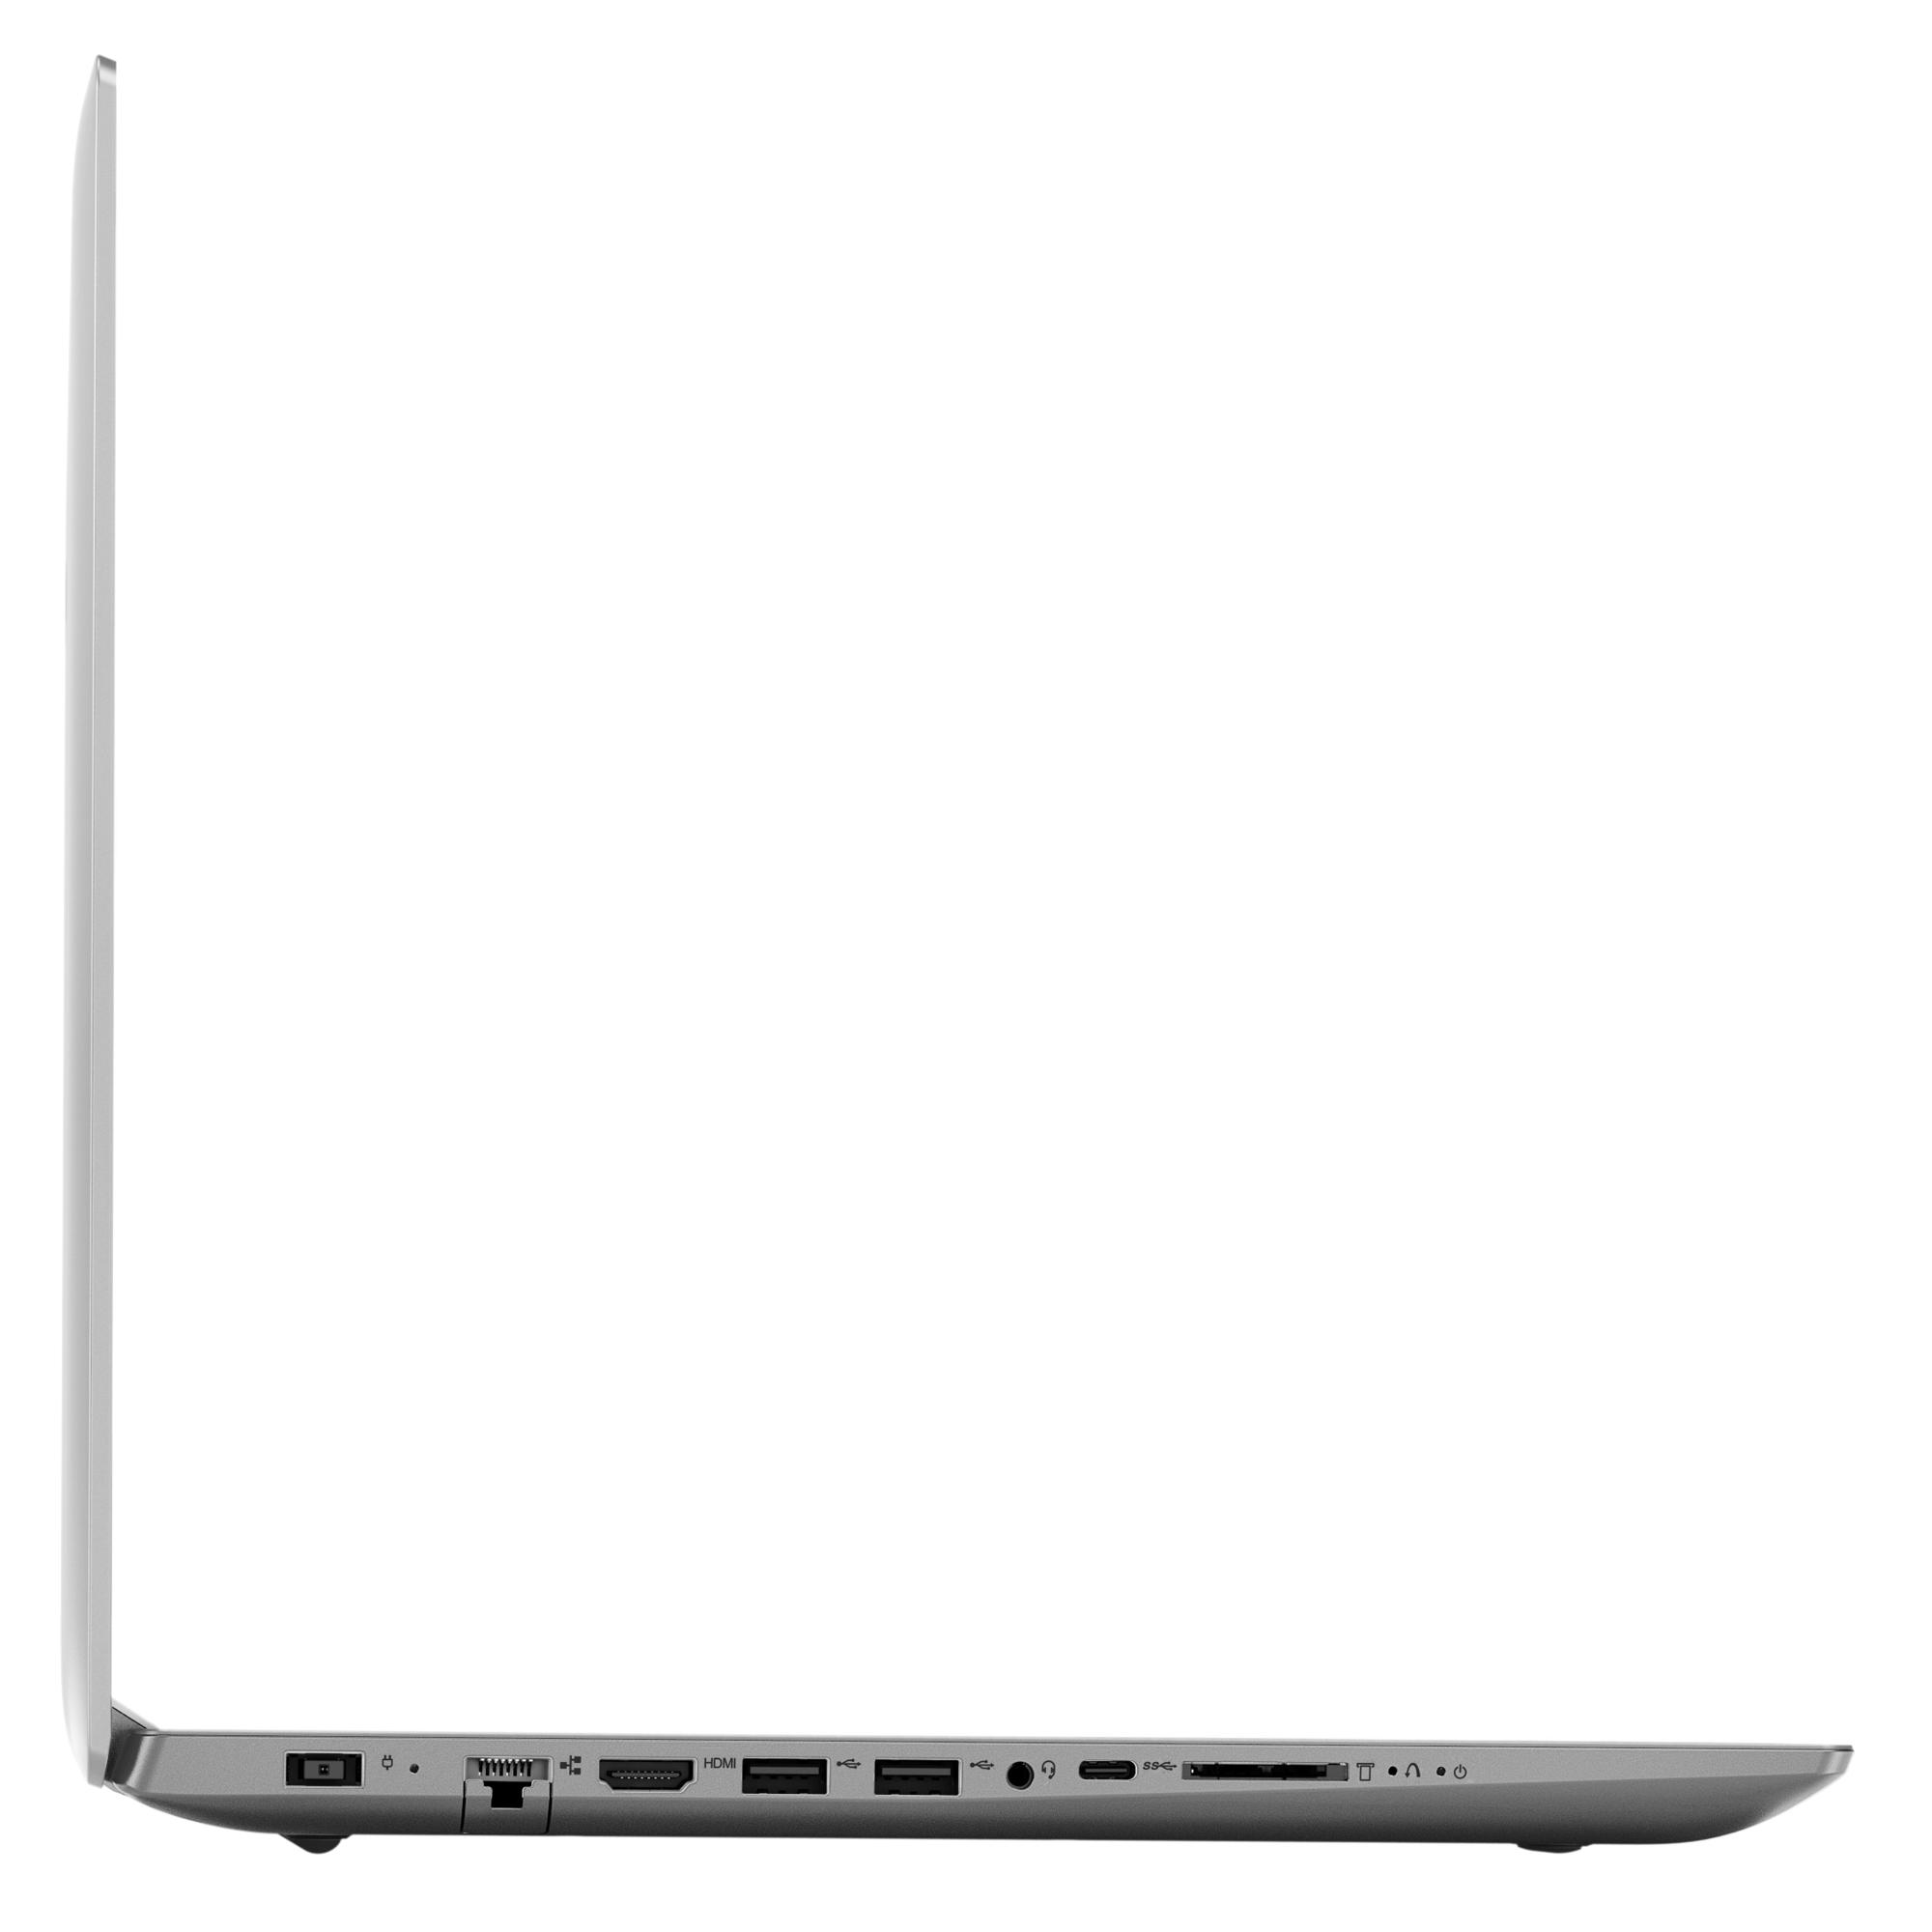 Фото  Ноутбук Lenovo ideapad 330-15IKB Platinum Grey (81DC00YBRU)